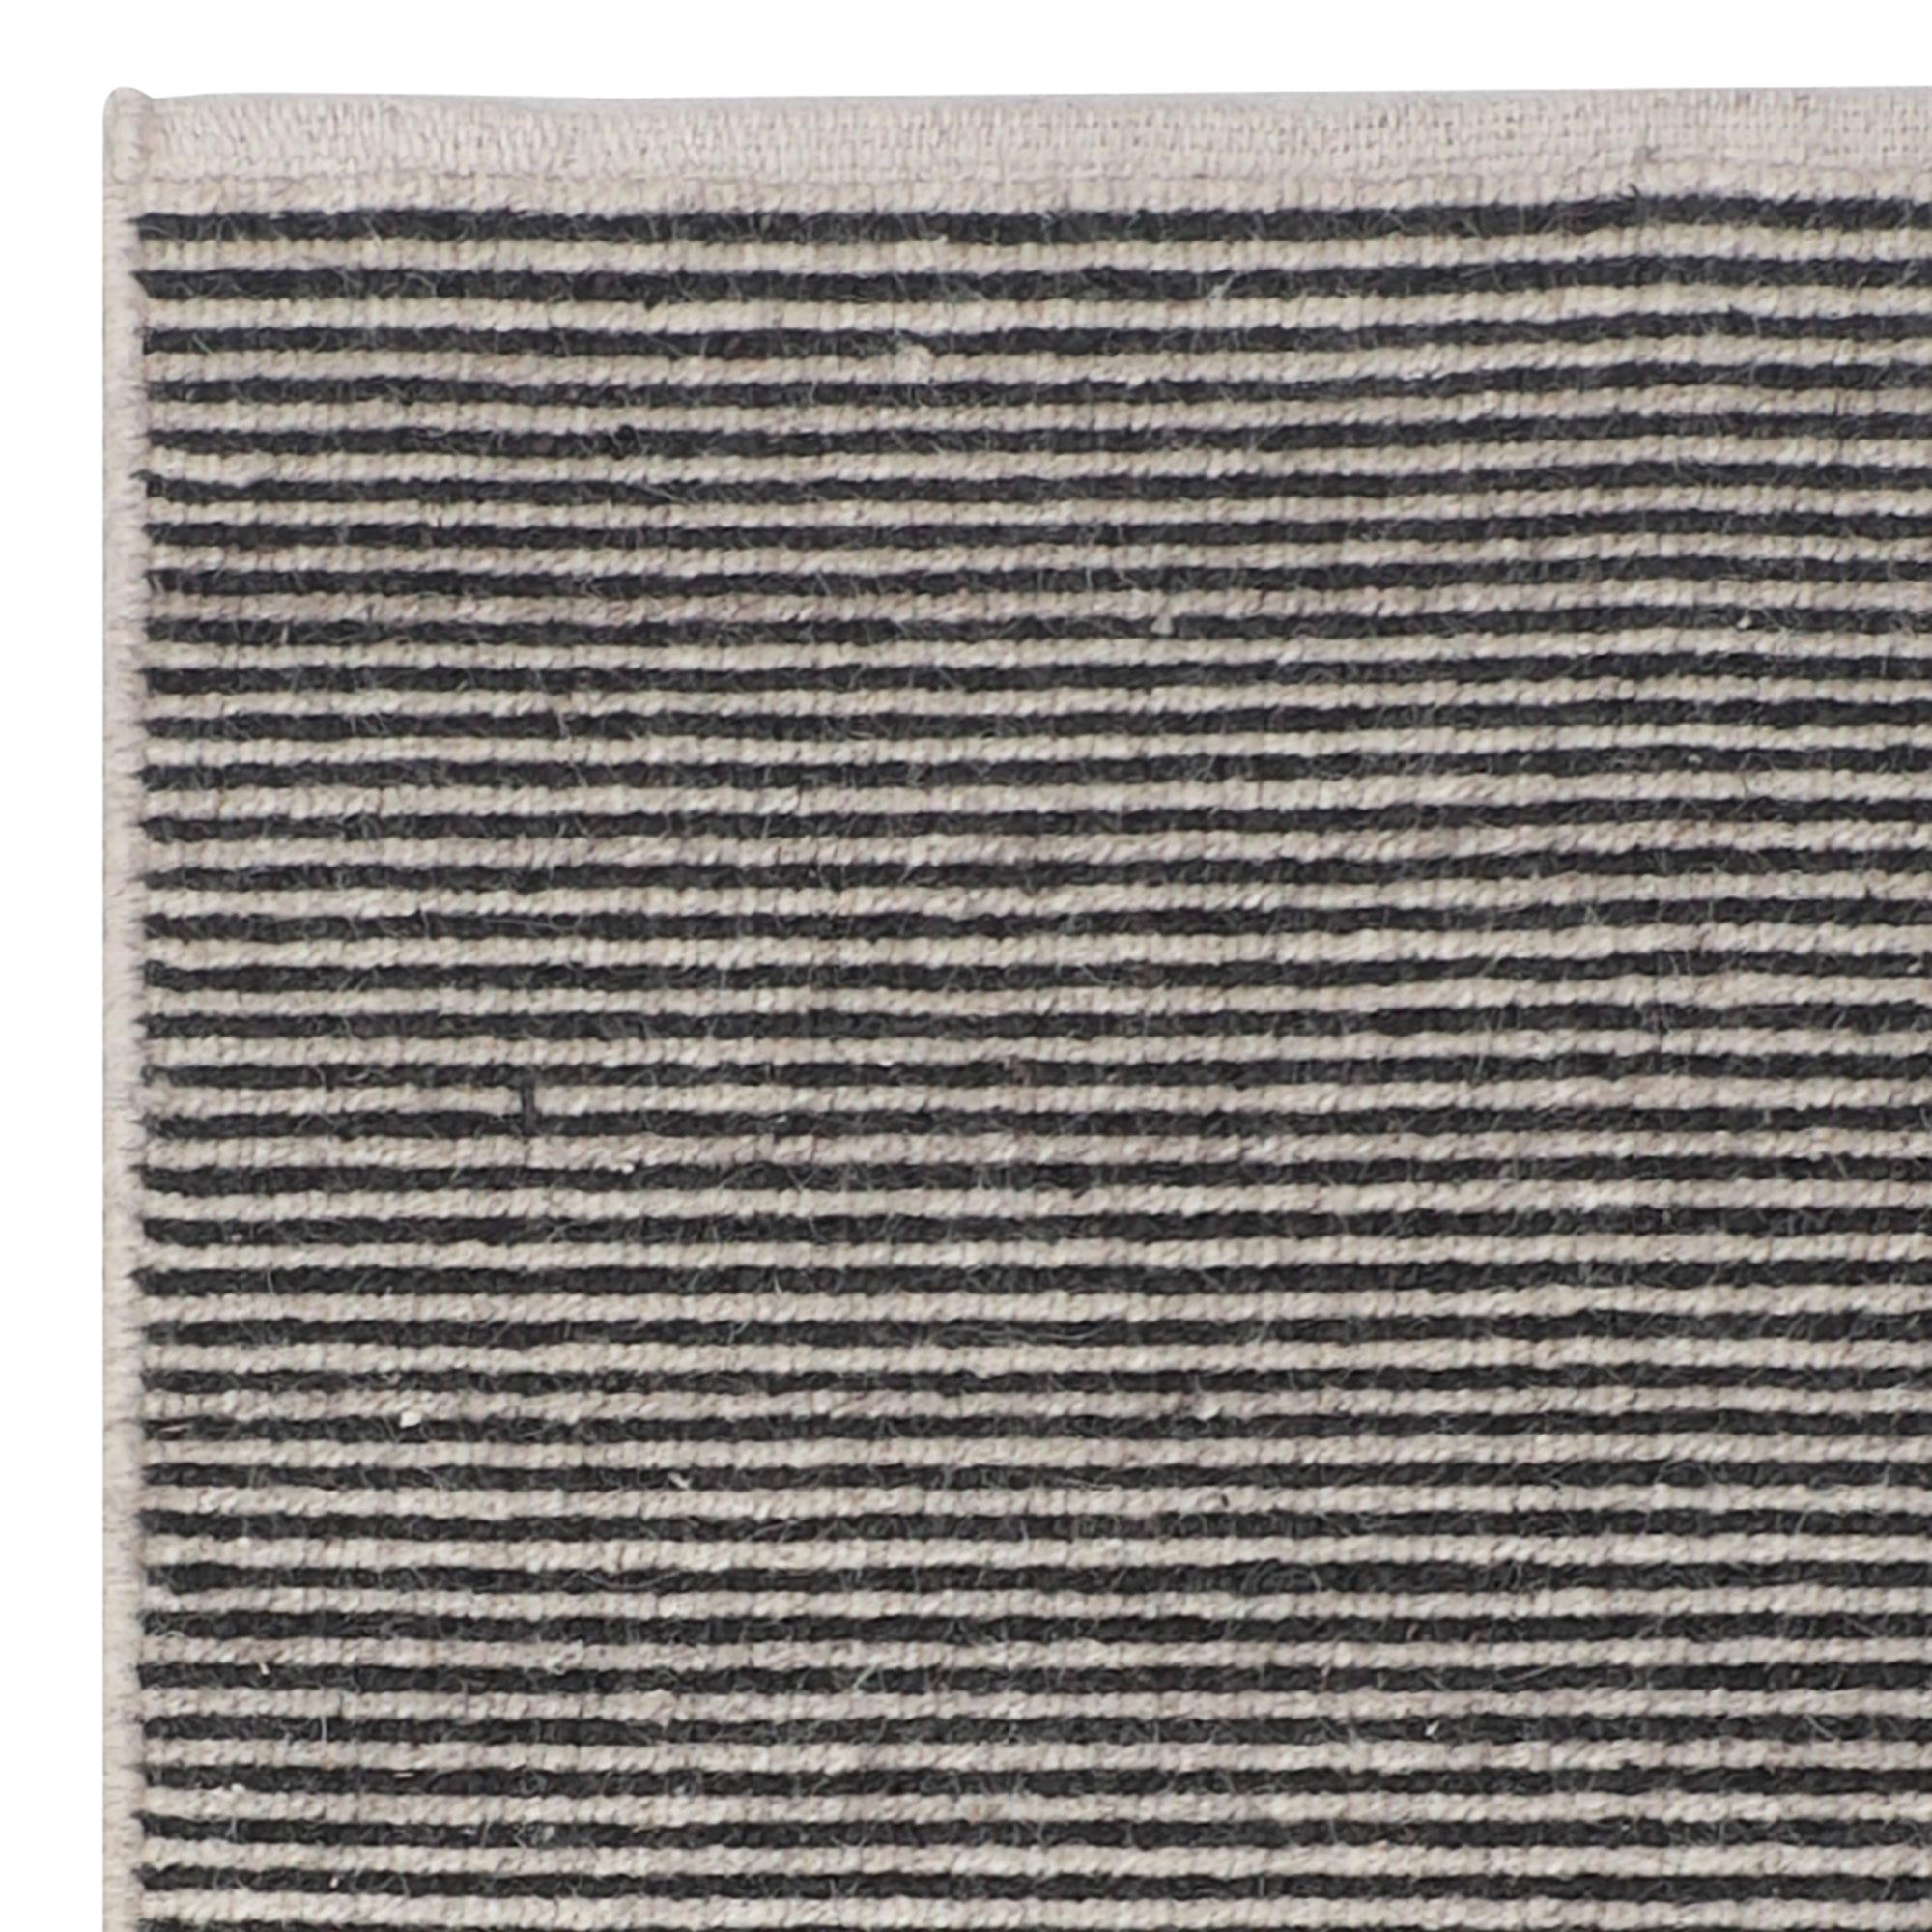 Boheme-charcoal-200x300_underside